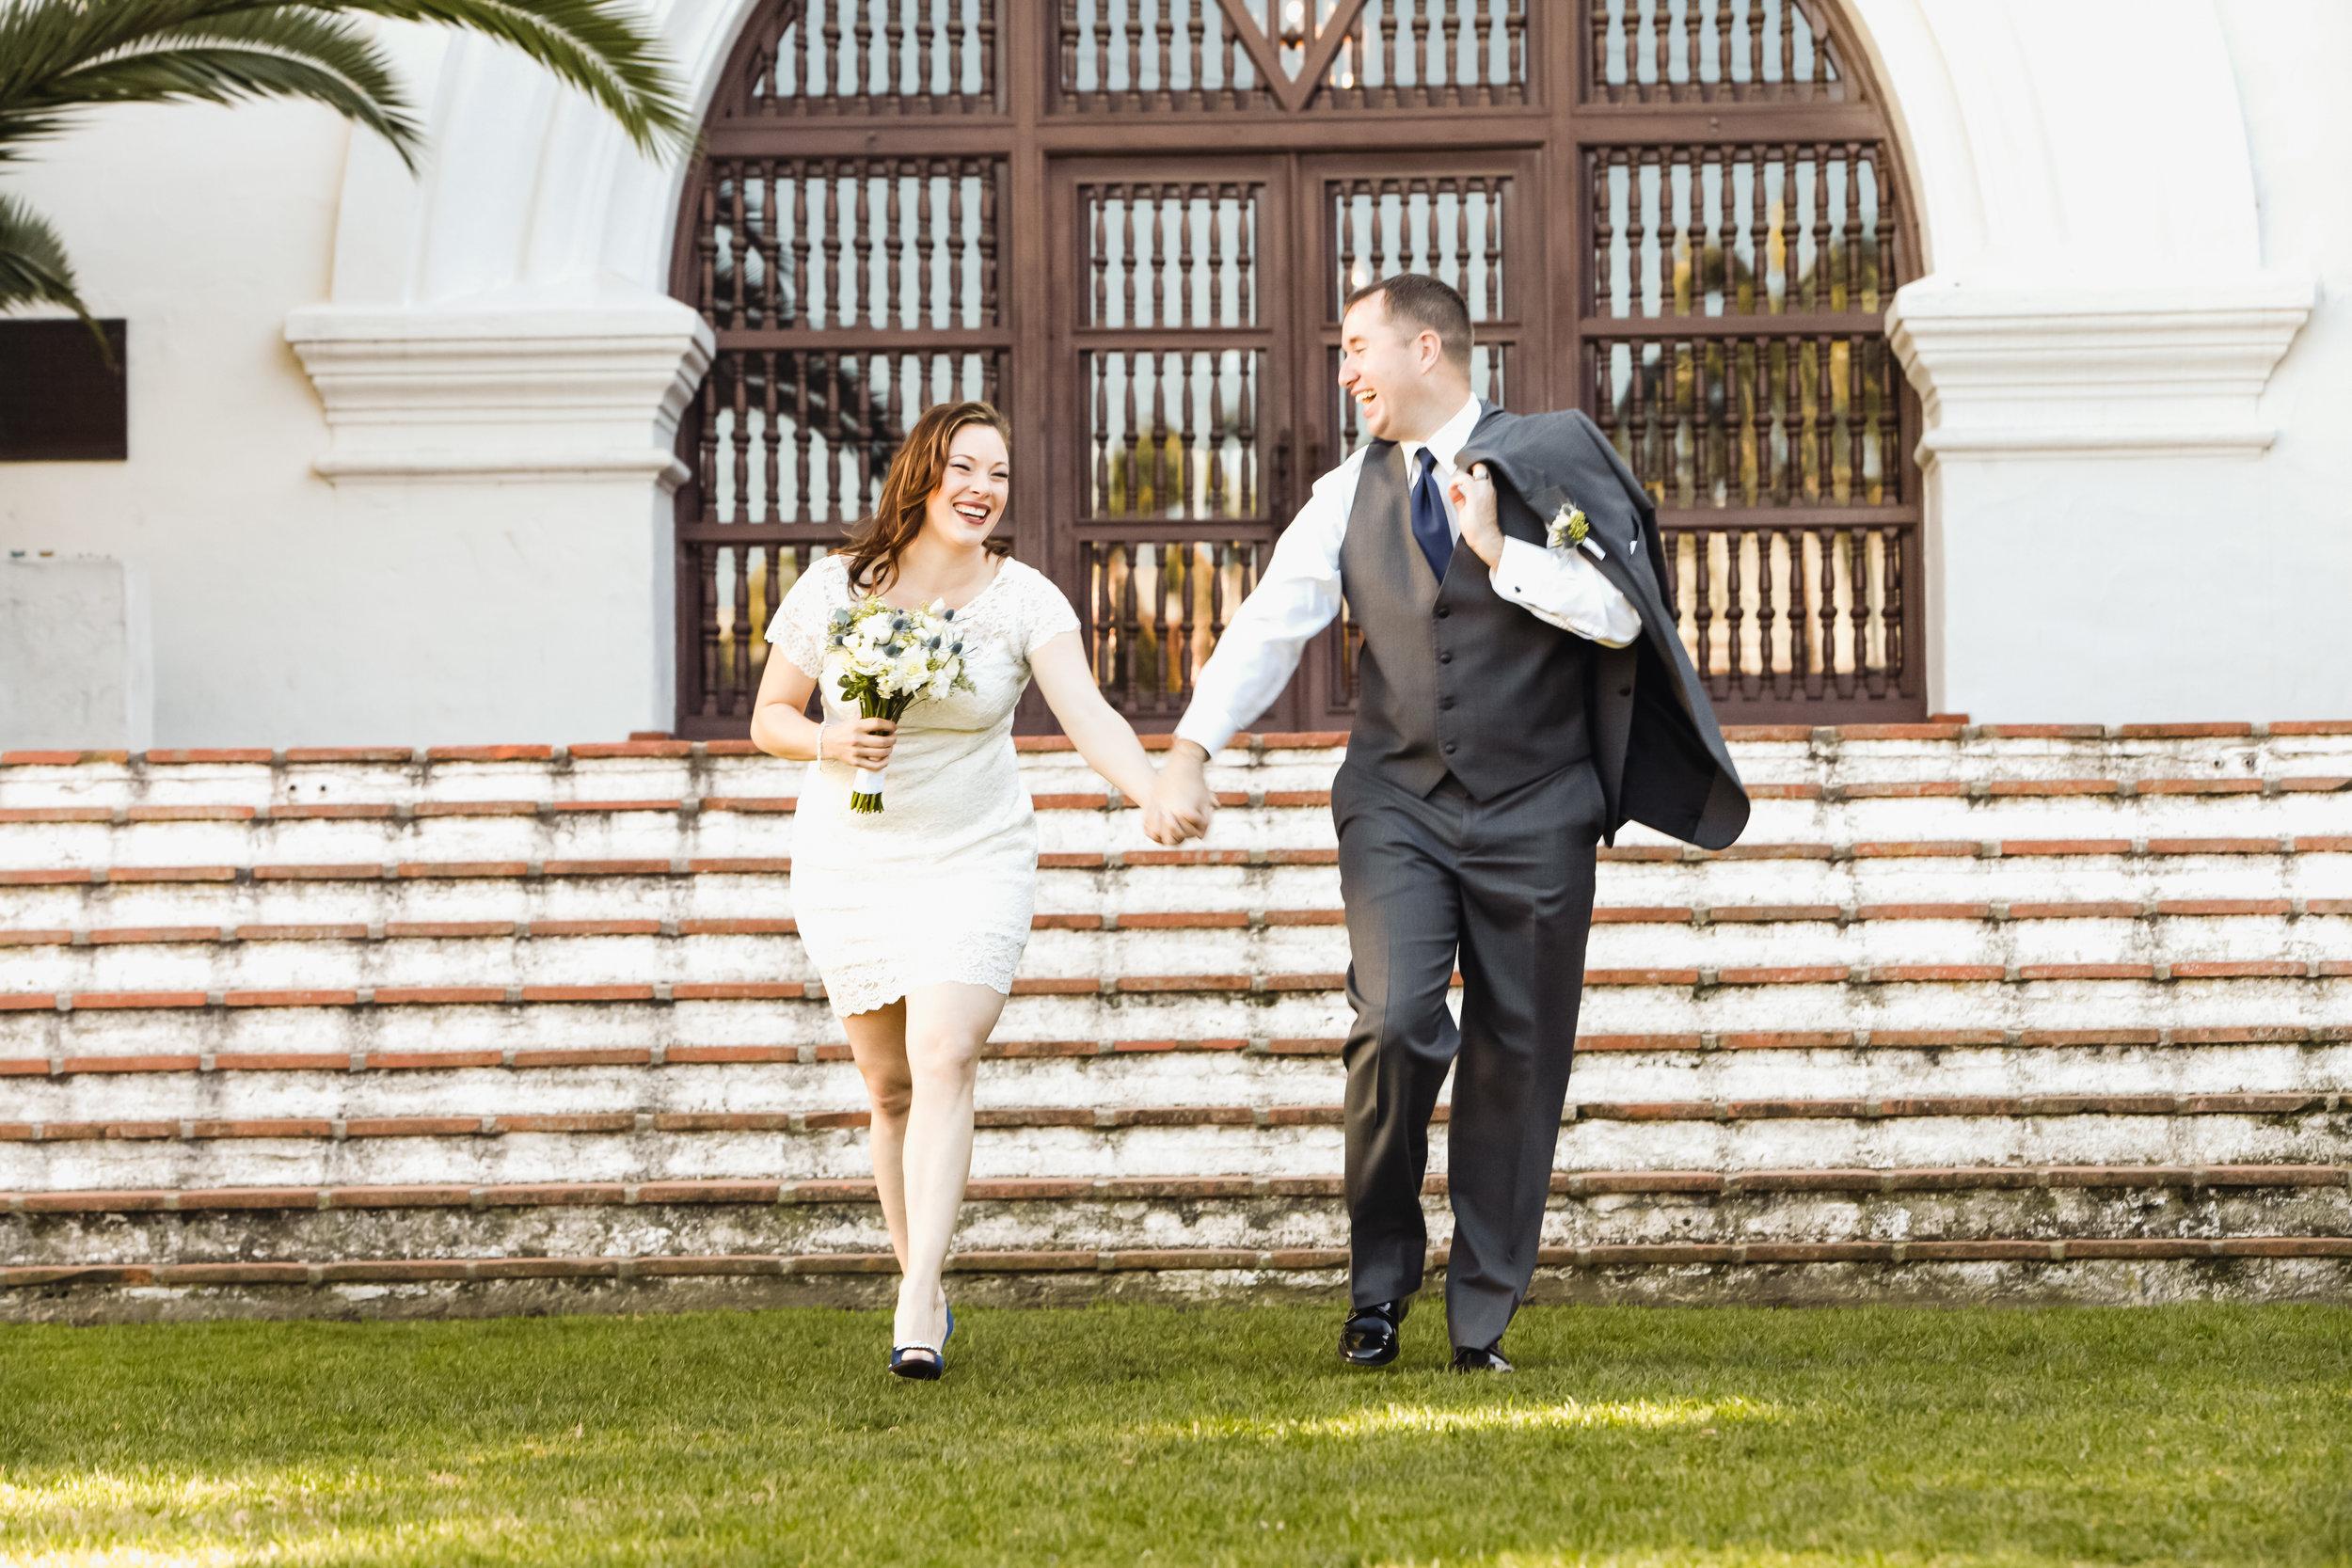 Gianna Keiko Atlanta Destination Wedding Elopement Photographer-27.jpg